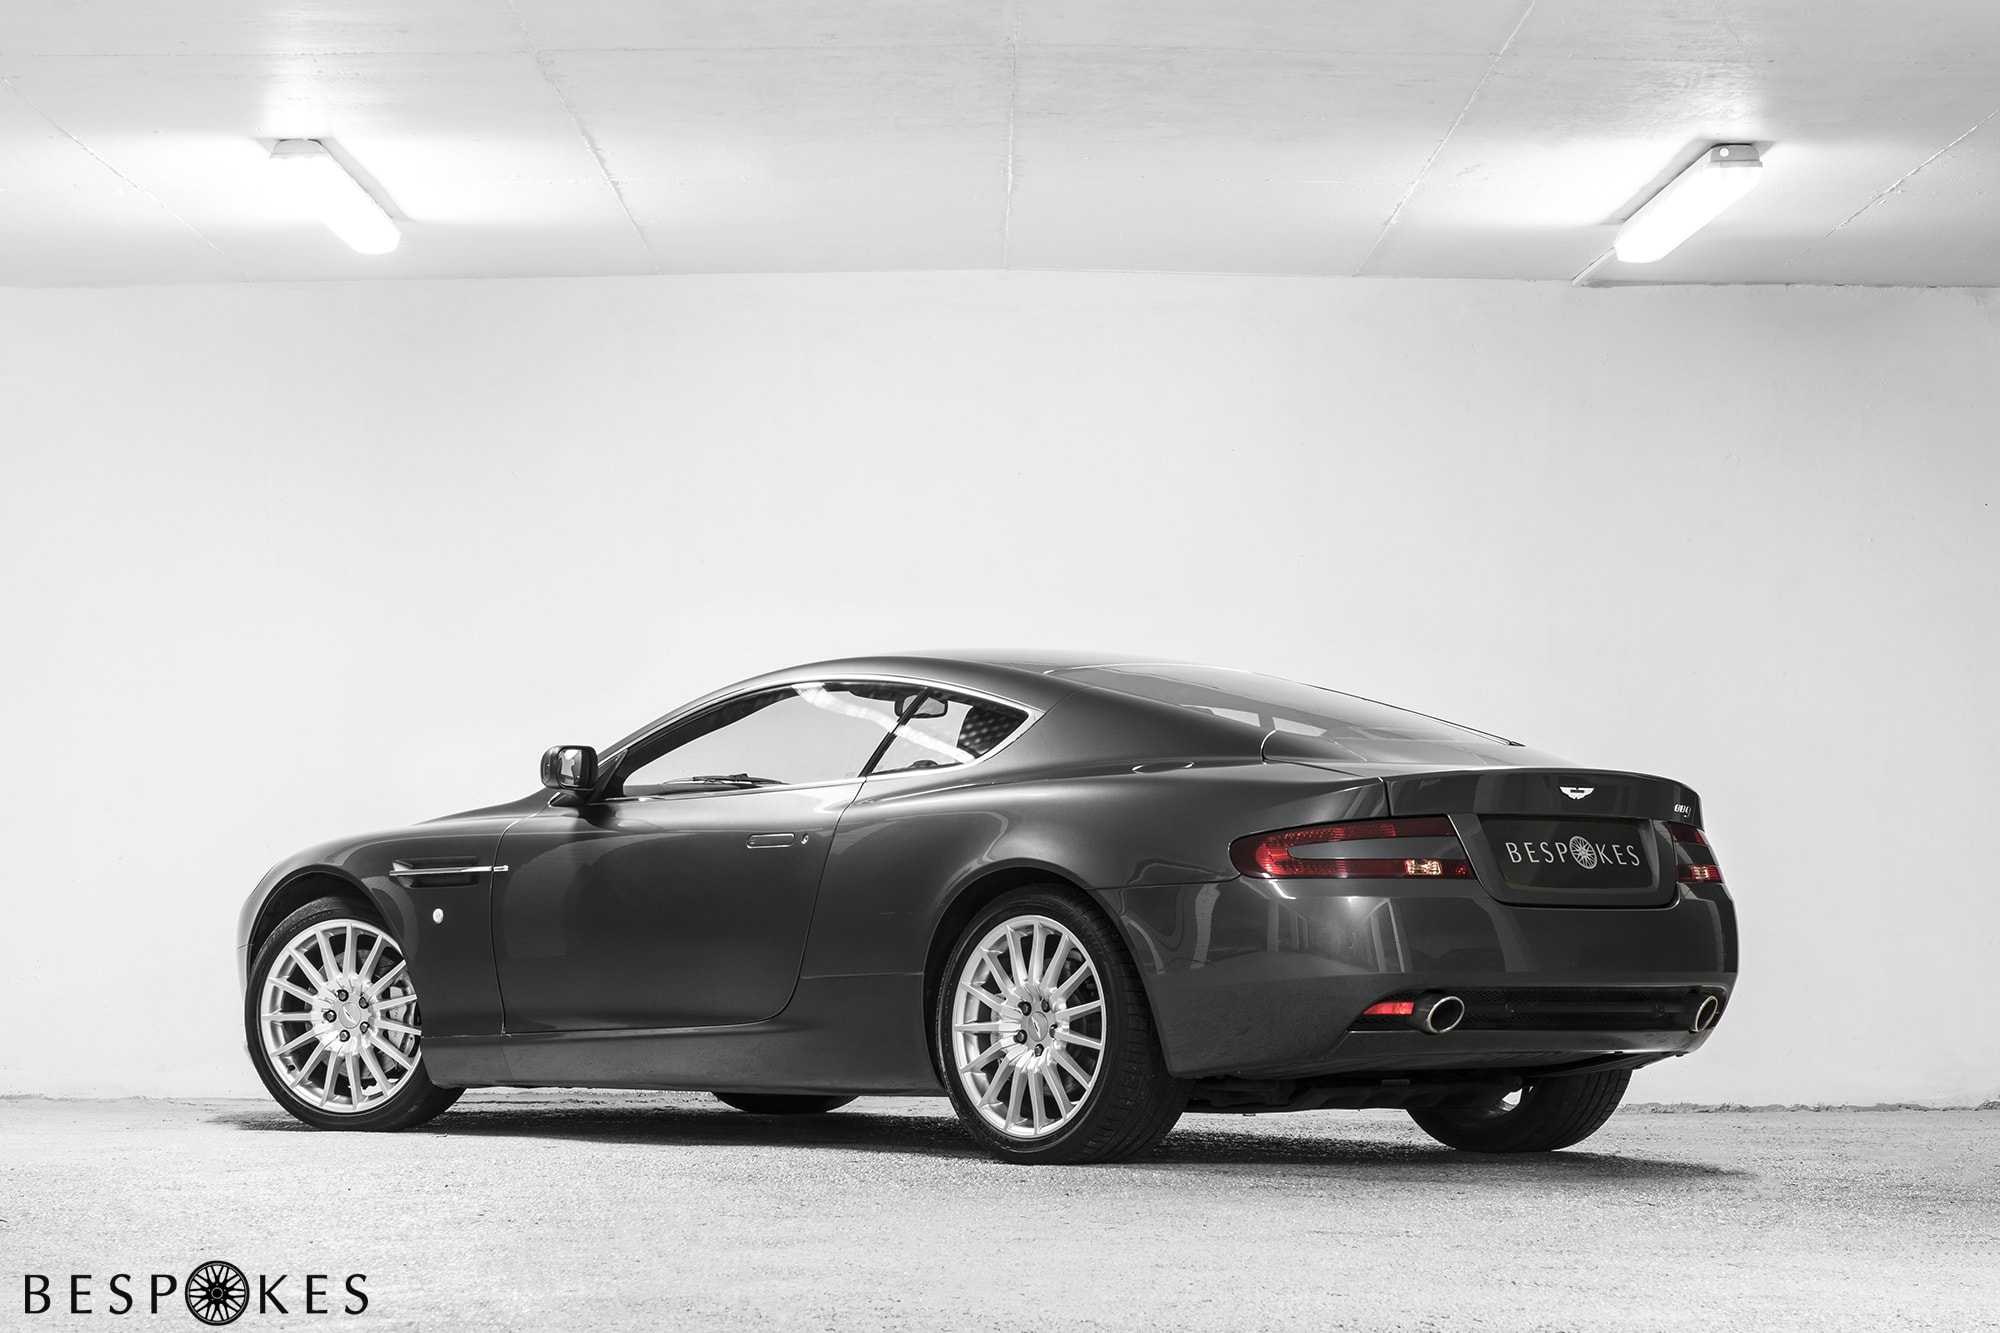 Aston Martin Db9 Bespokes